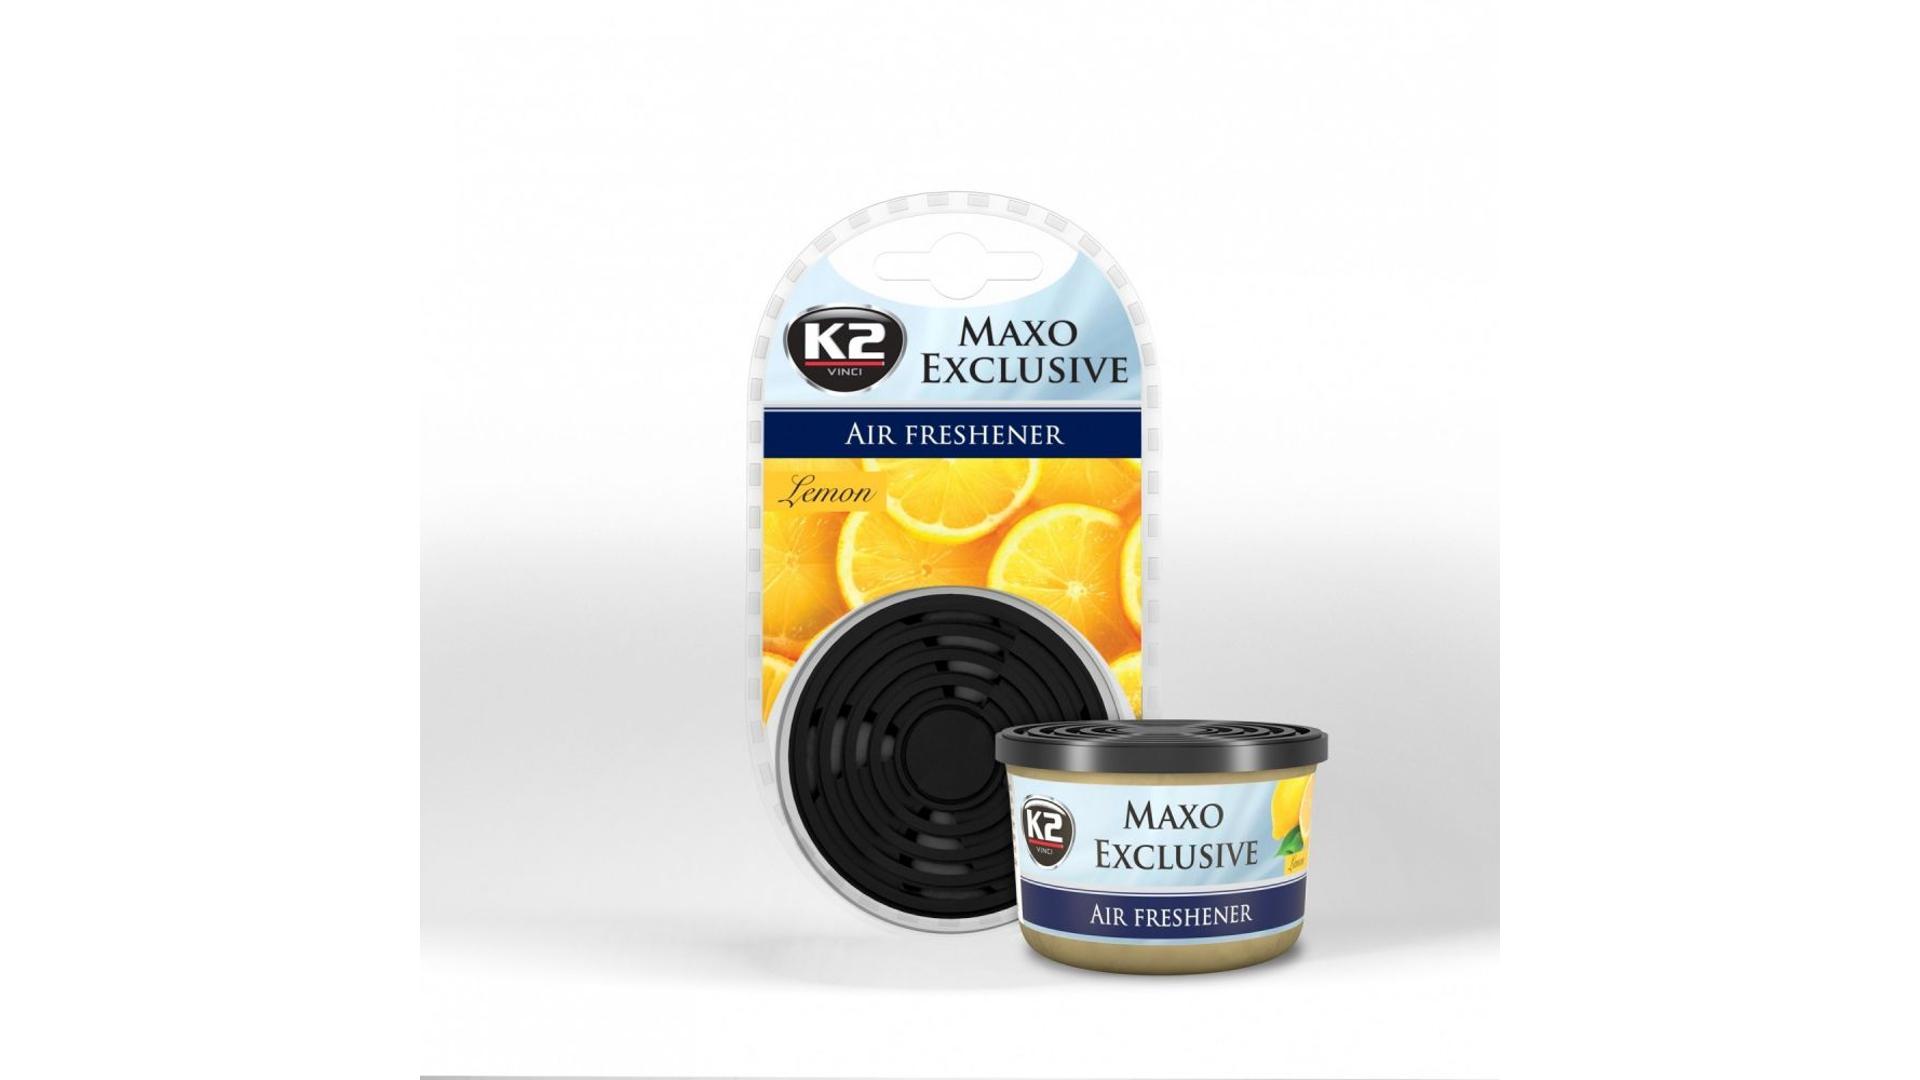 K2 MAXO EXCLUSIVE 45g LEMON